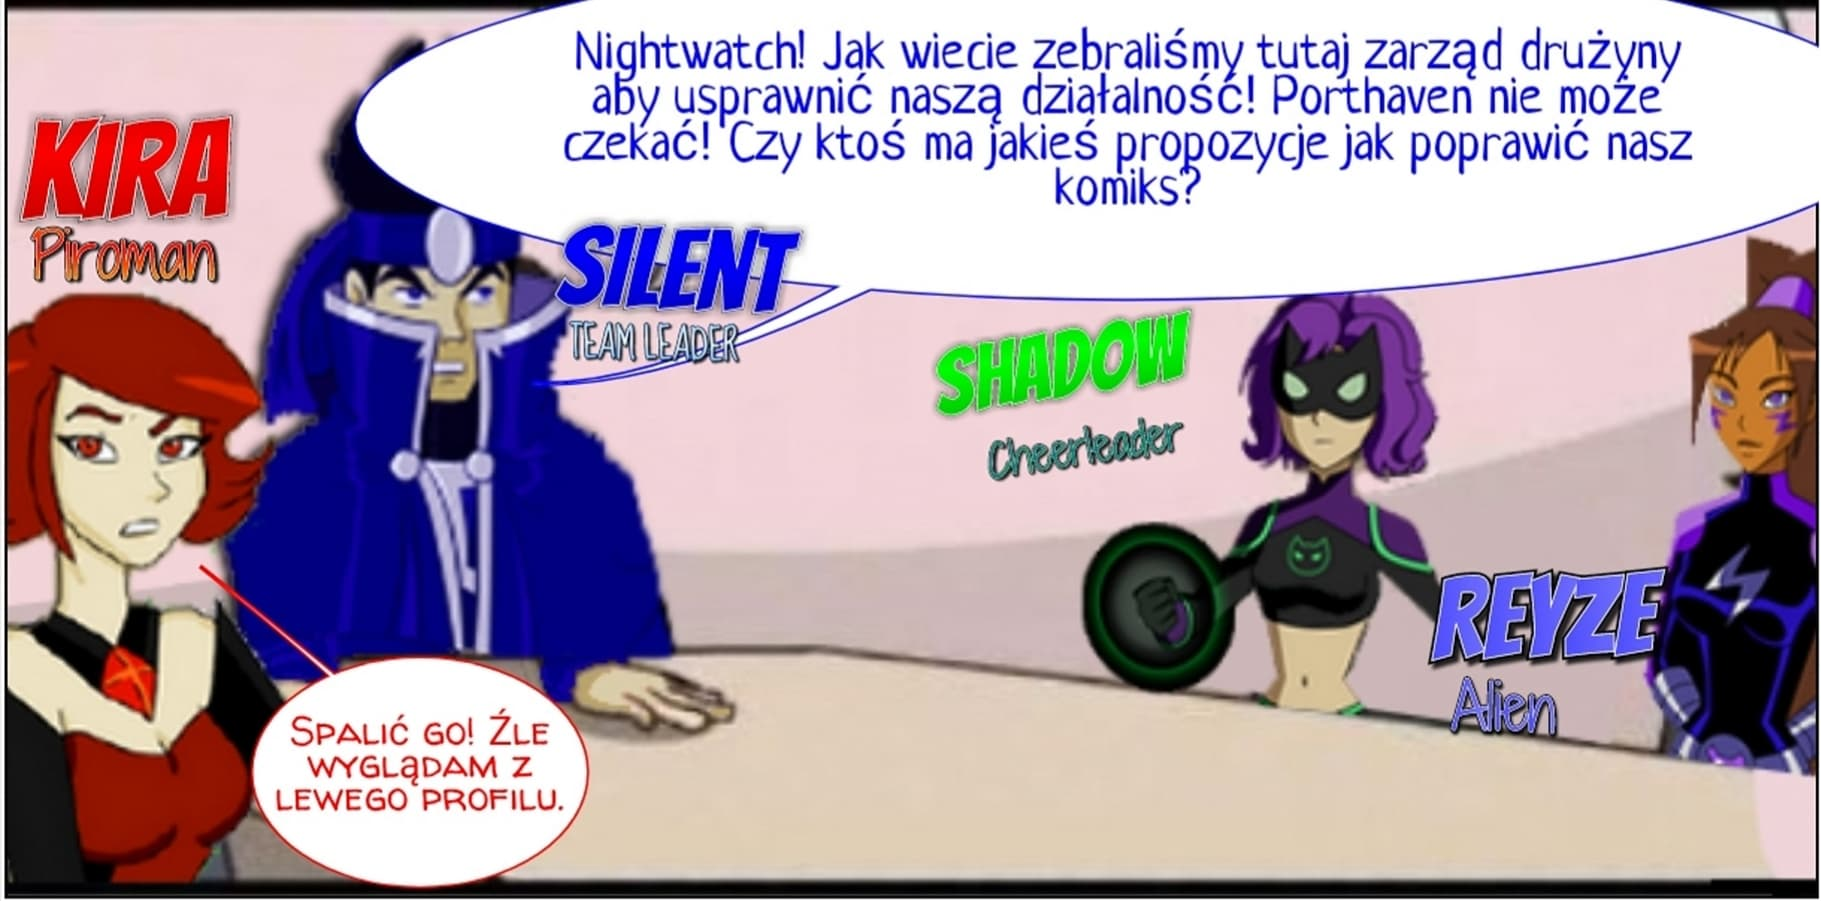 titansgo.pl/upload/img/5f5d6febd12f0.jpg